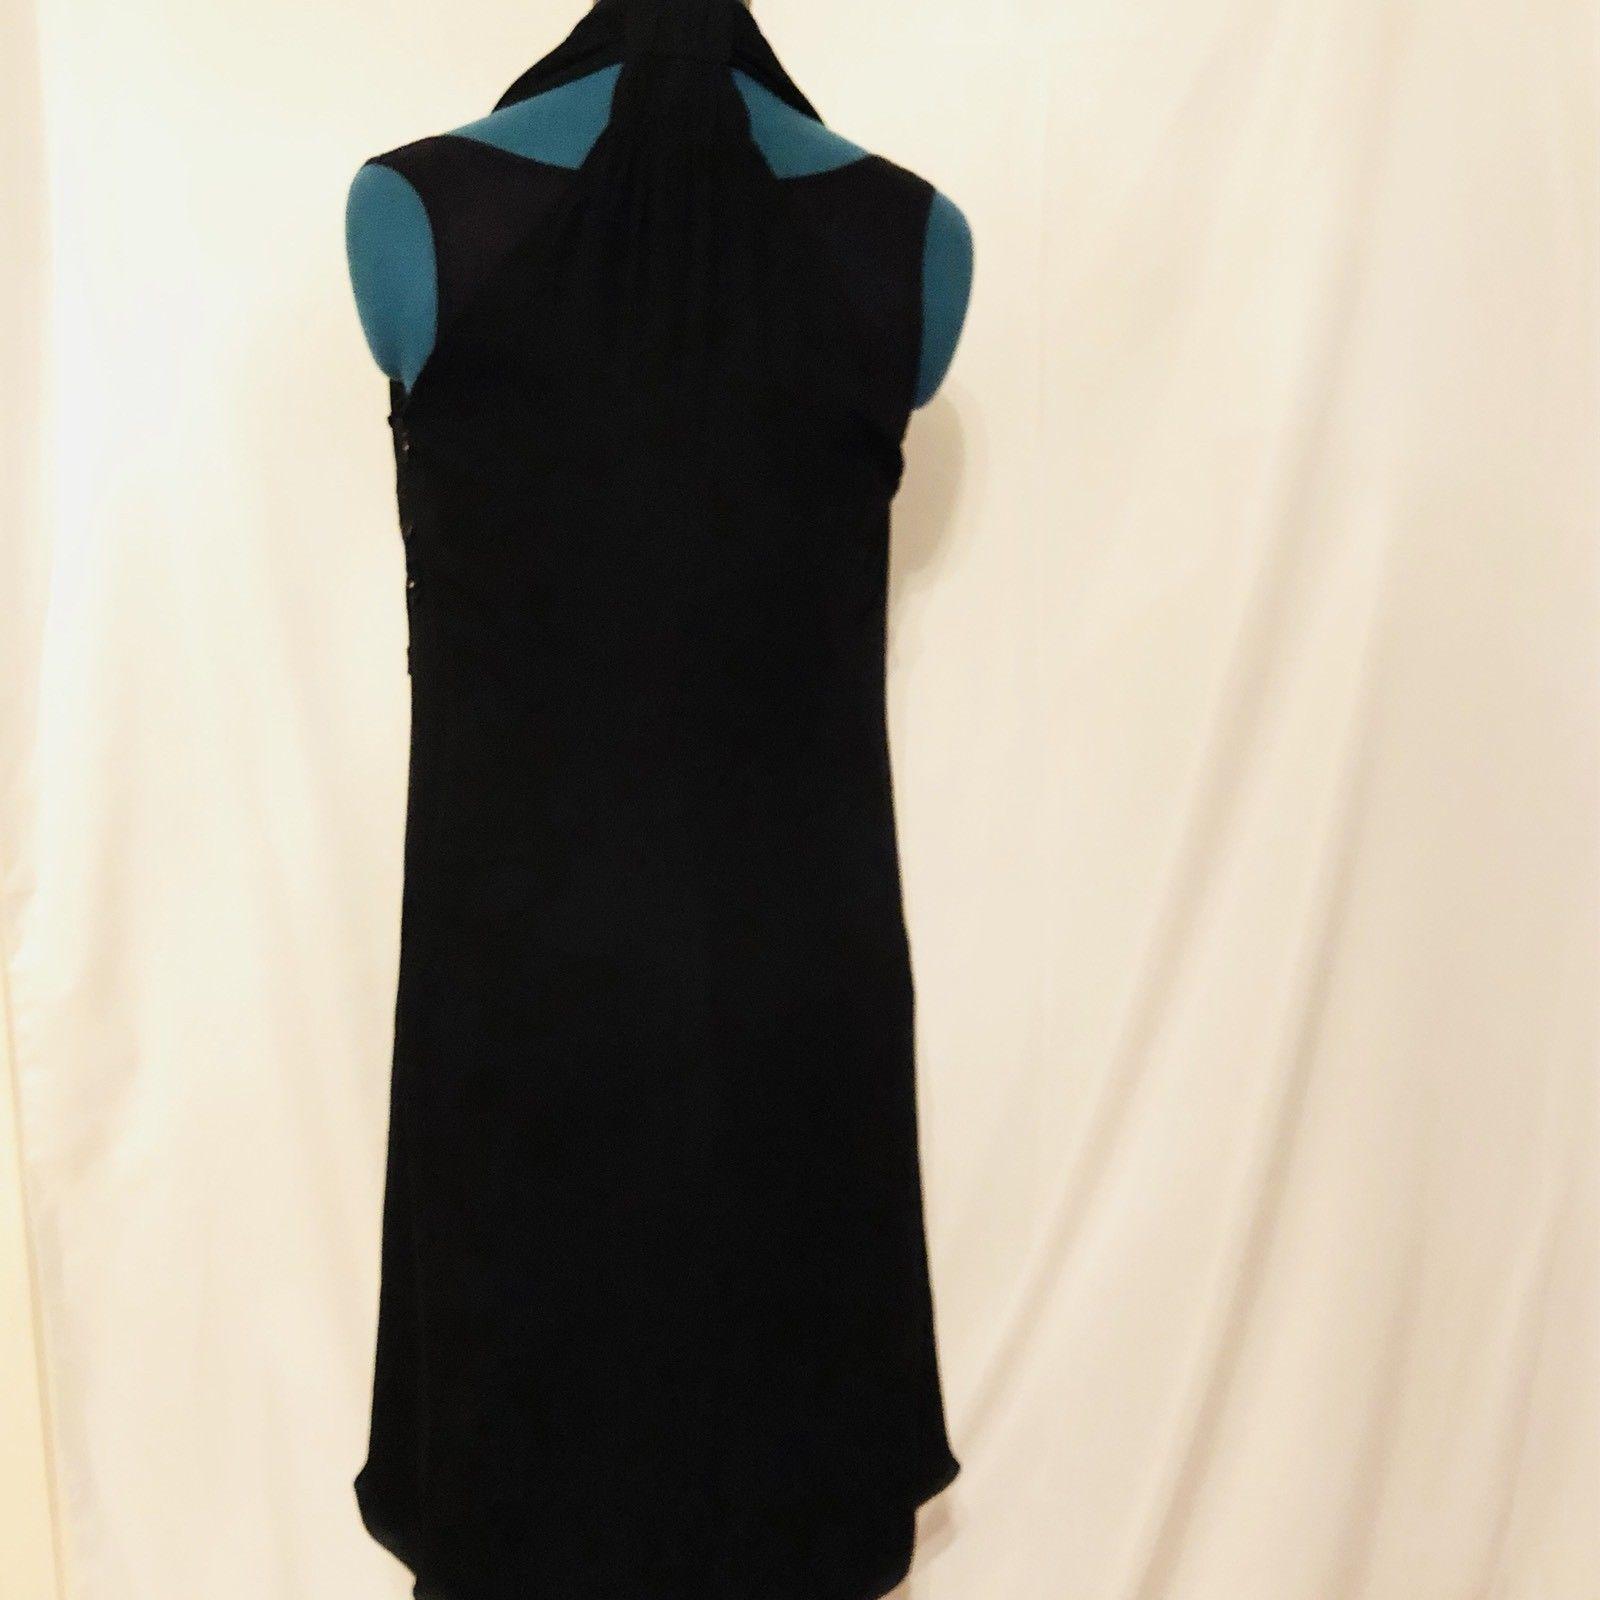 Armani Collezioni Black Halter Lined Dress Size 10 EU 46 Prom Evening image 4